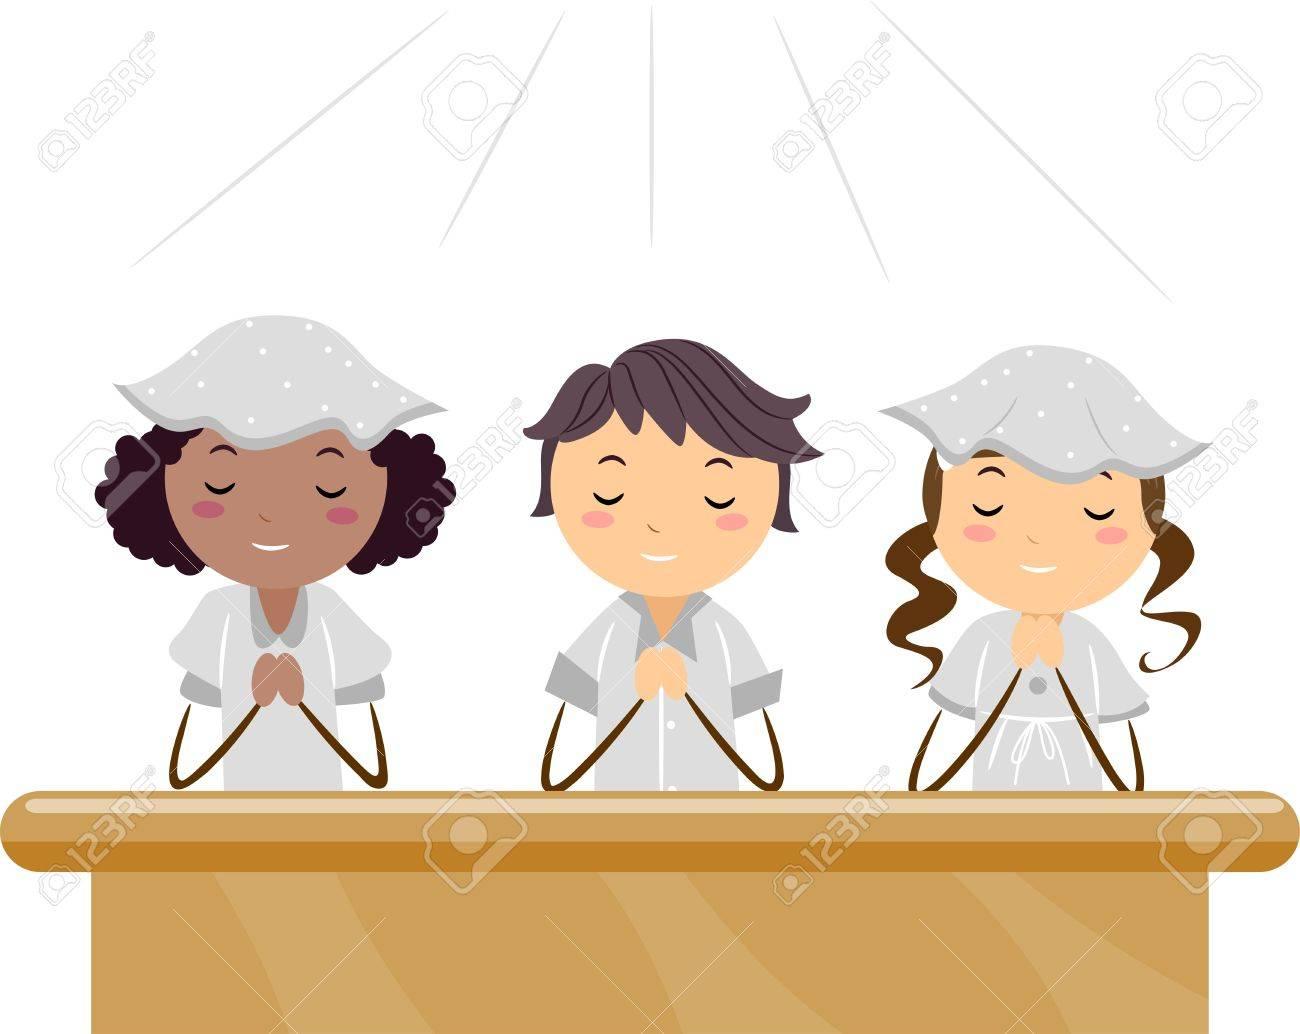 Illustration of Kids Praying in a Church Stock Illustration - 9707207